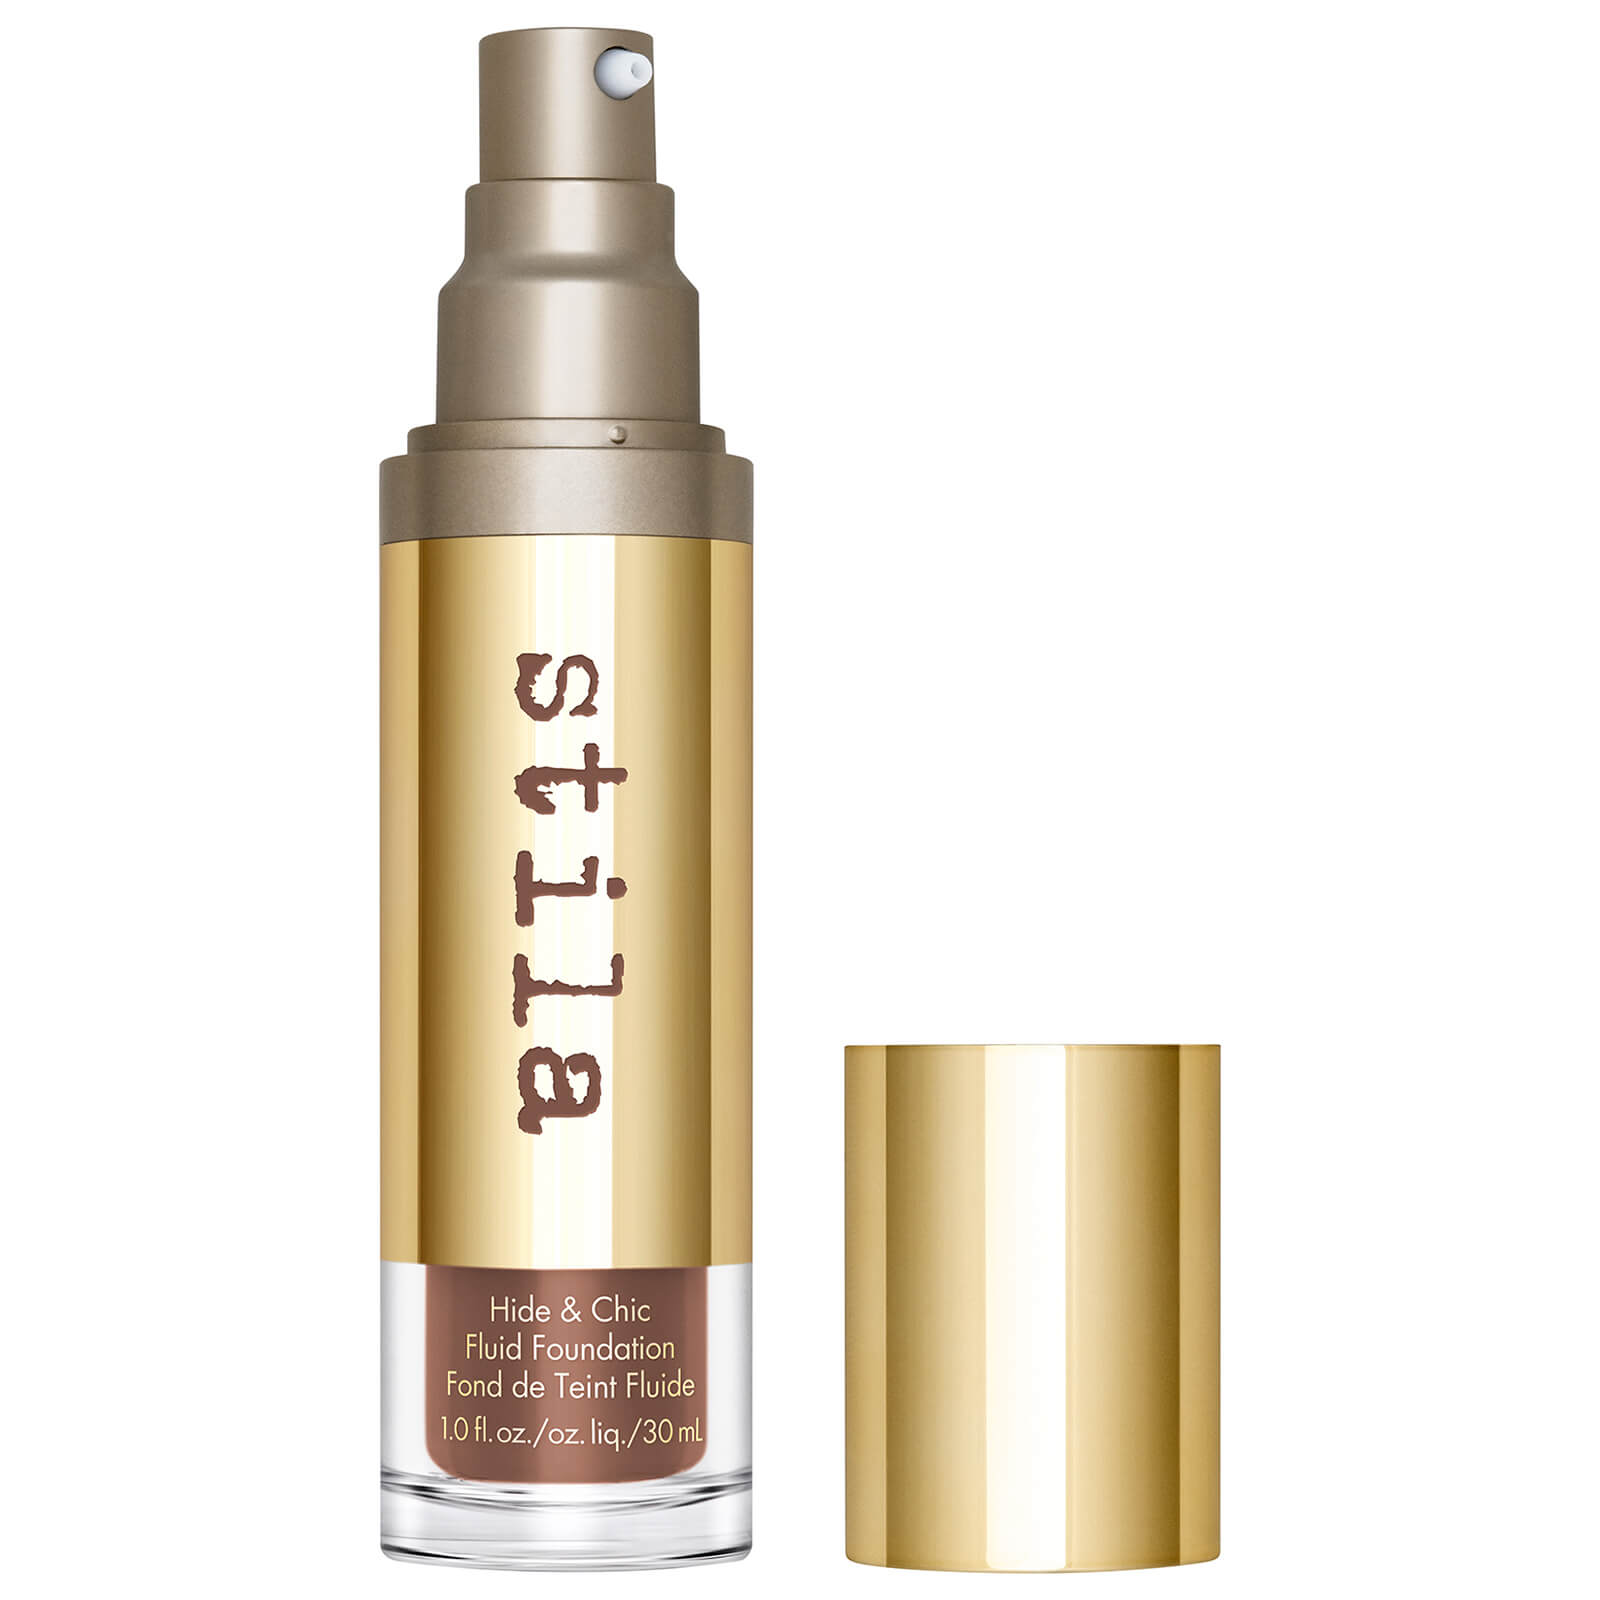 Купить Stila Hide and Chic Fluid Foundation 30ml (Various Shades) - Deep 3